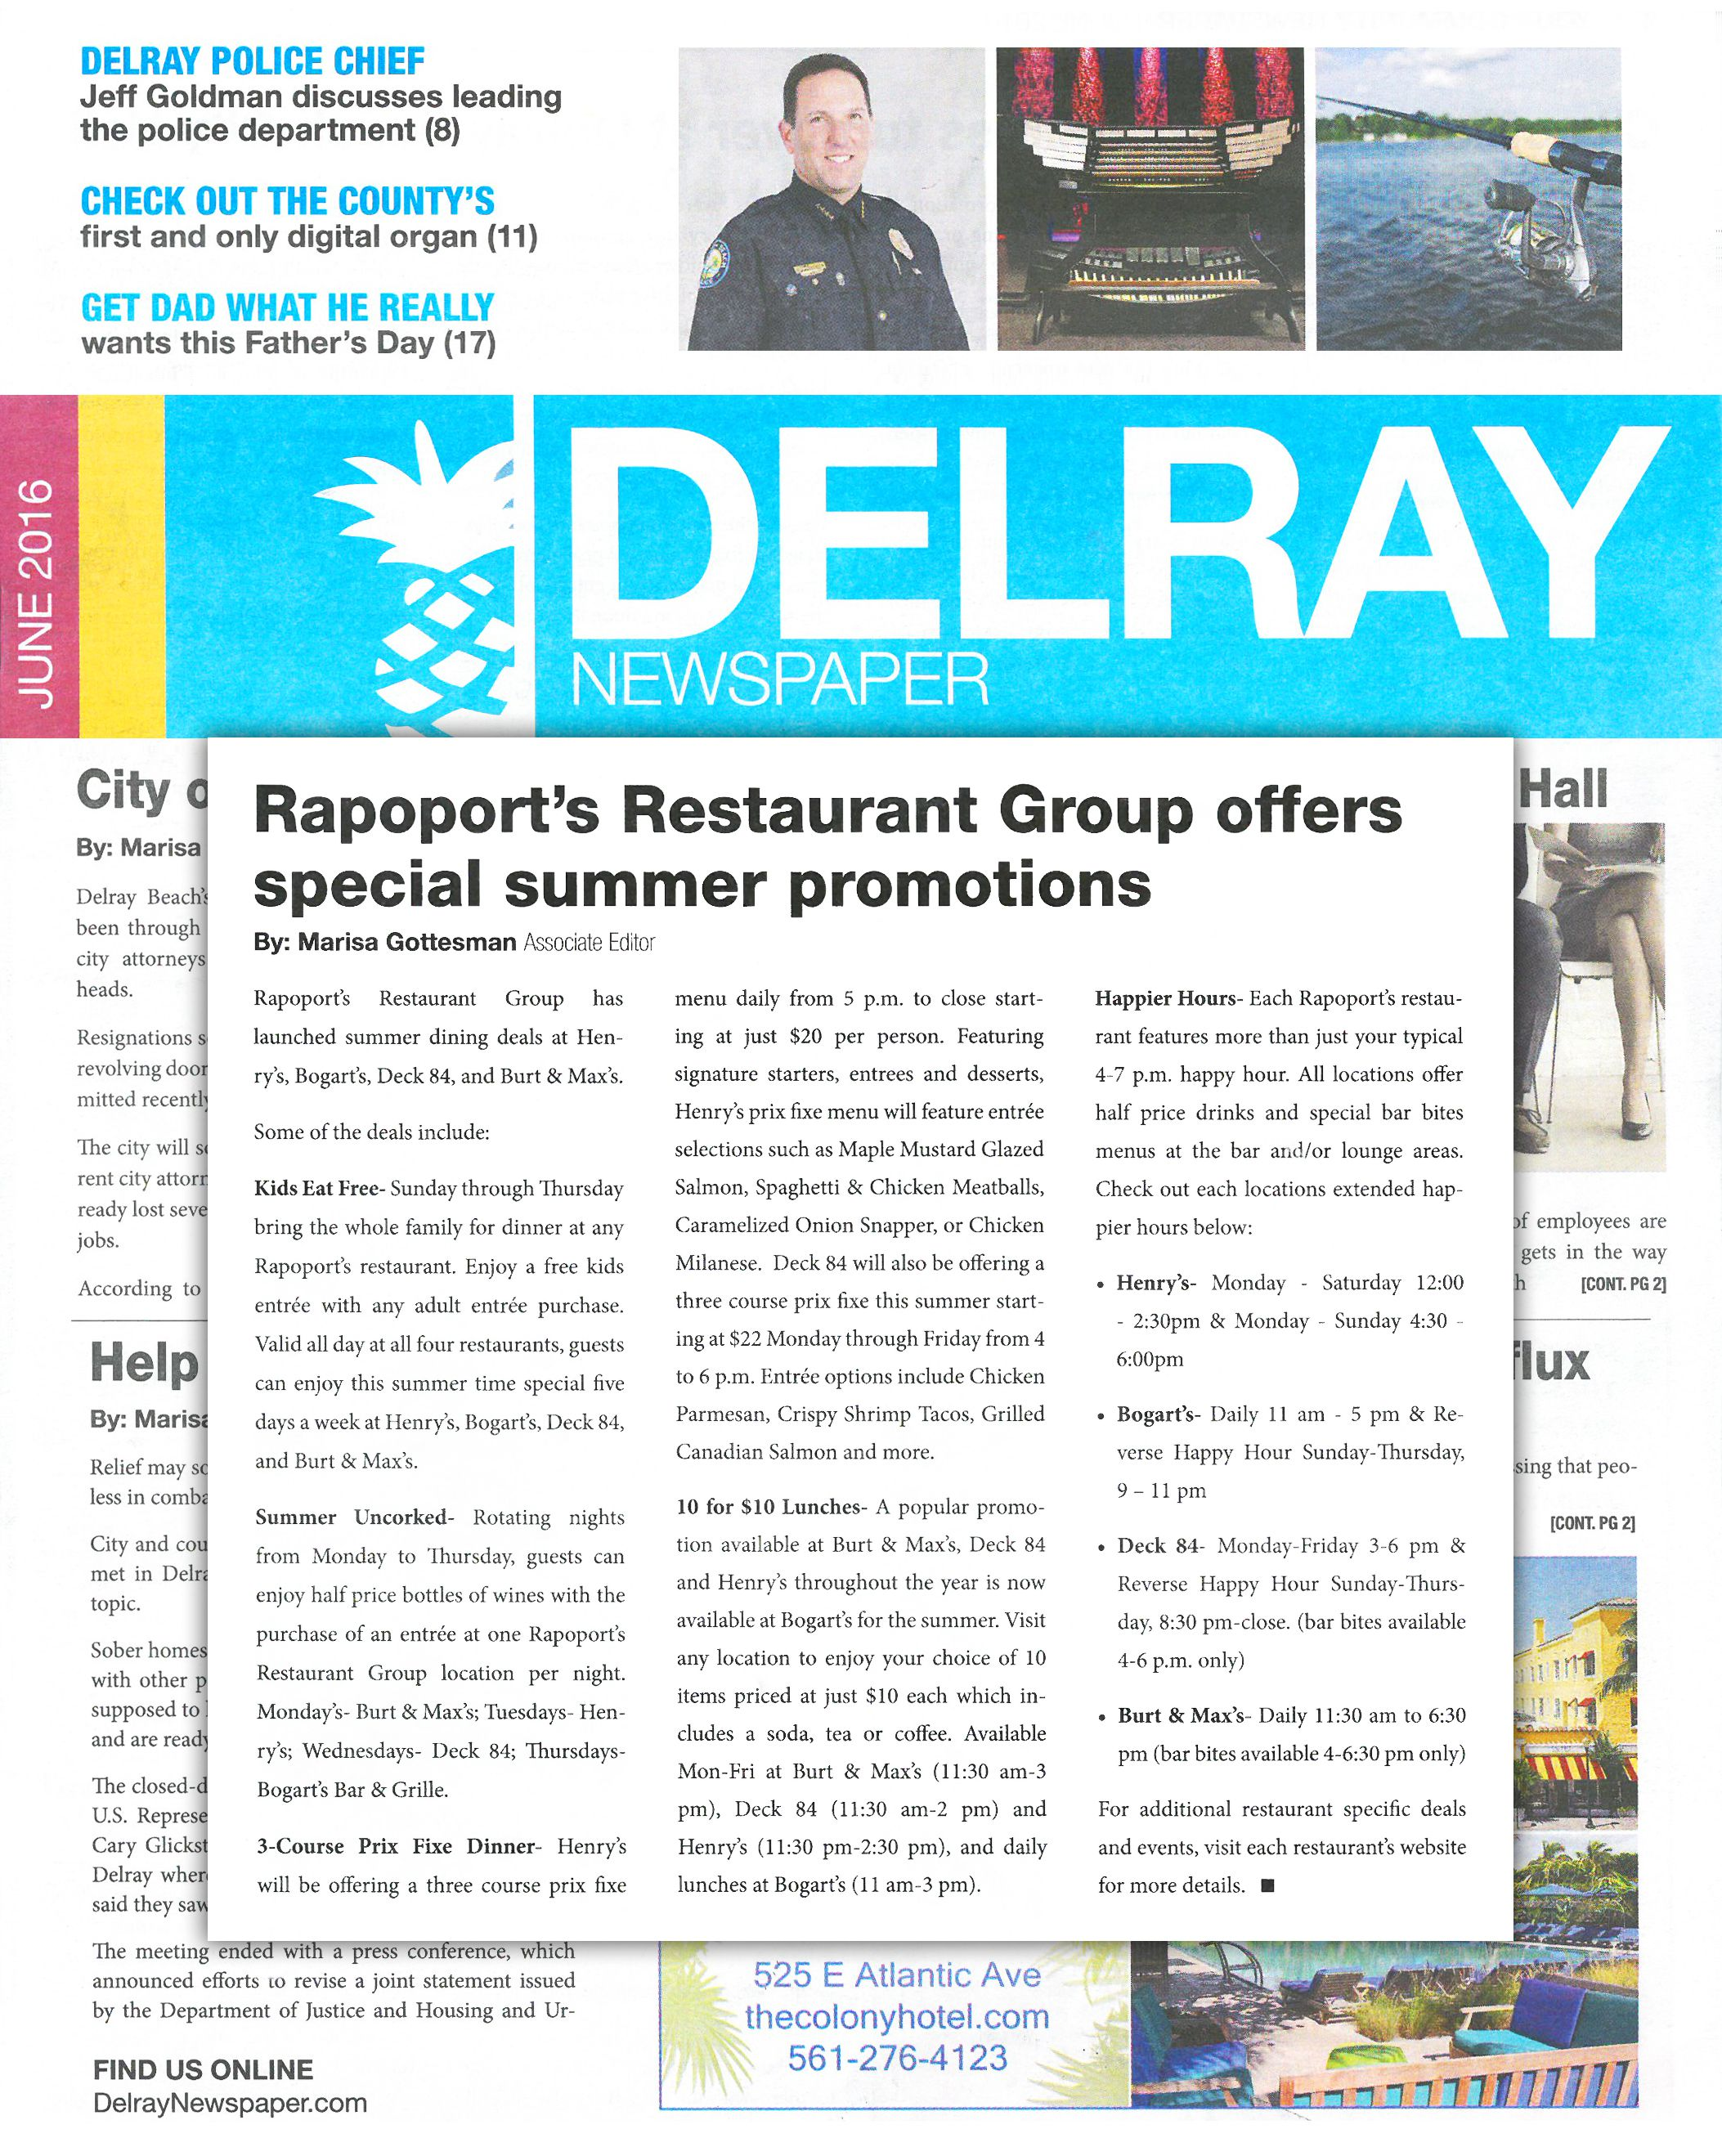 Delray-Newspaper-June-2016.jpg